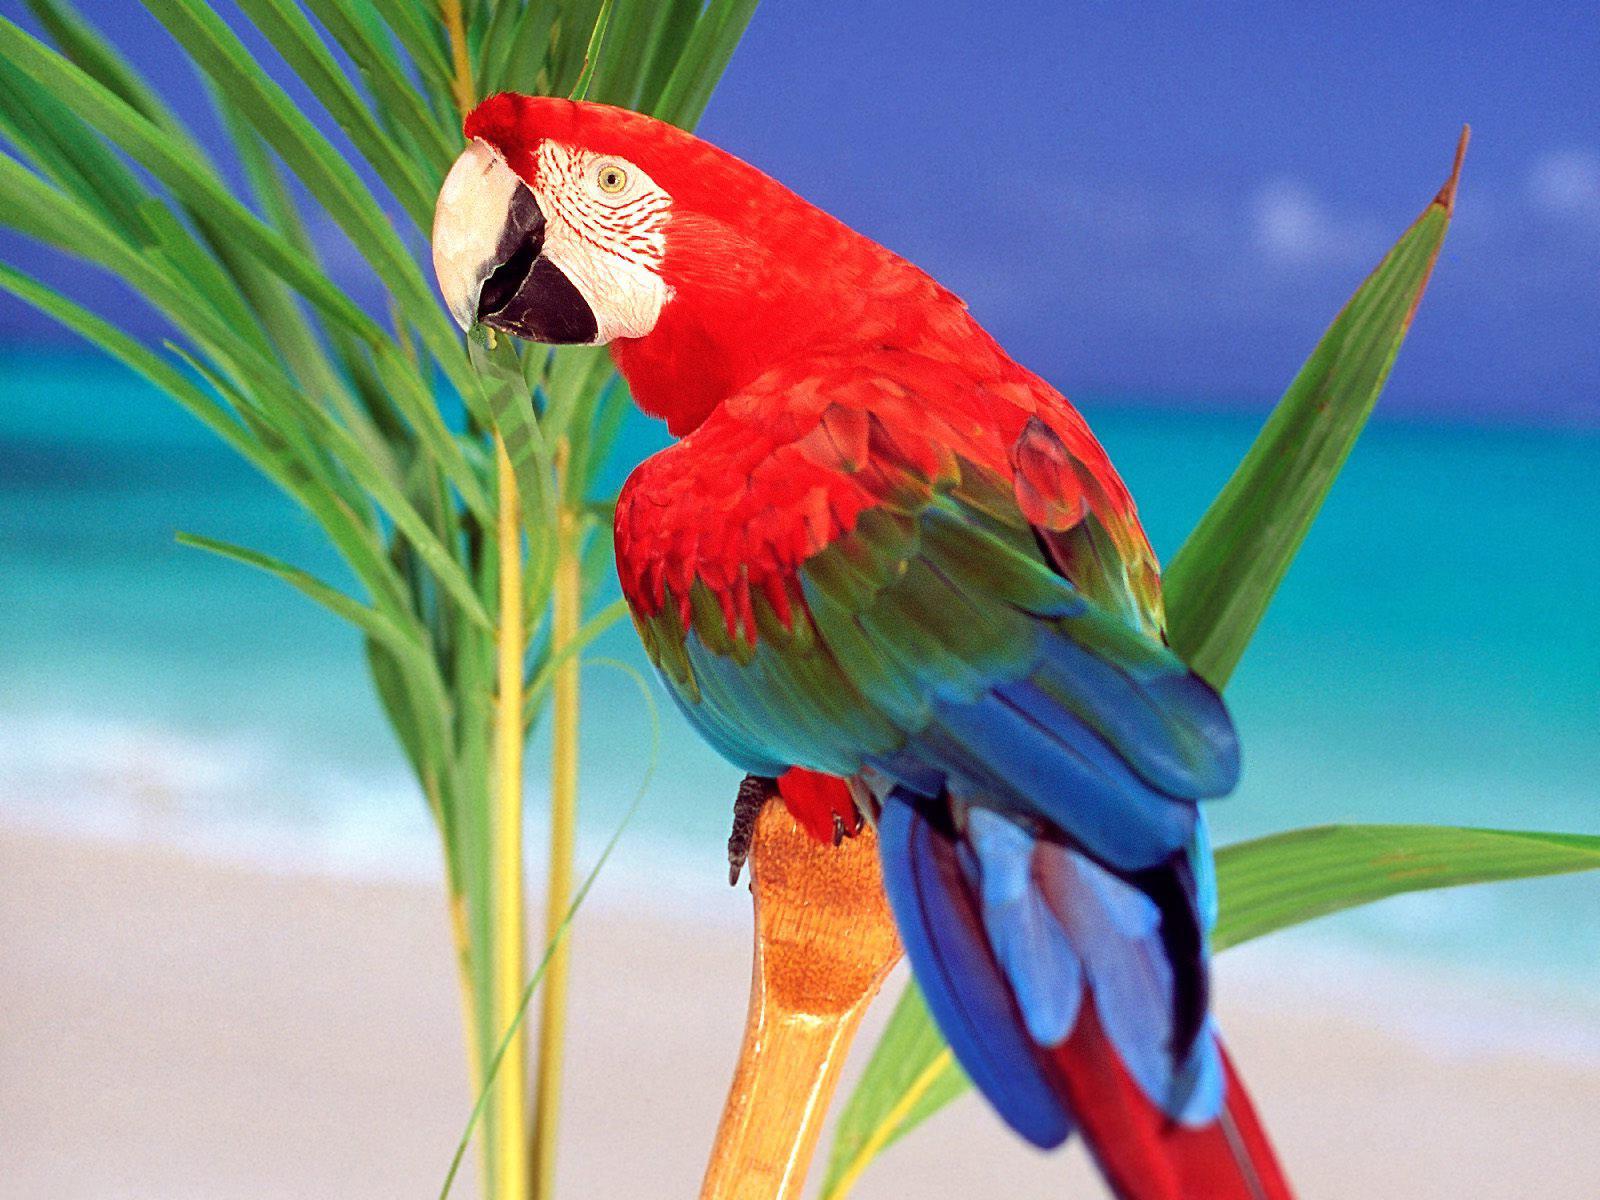 desktop parrots birds pics desktop parrots birds pictures wallpaper 1600x1200